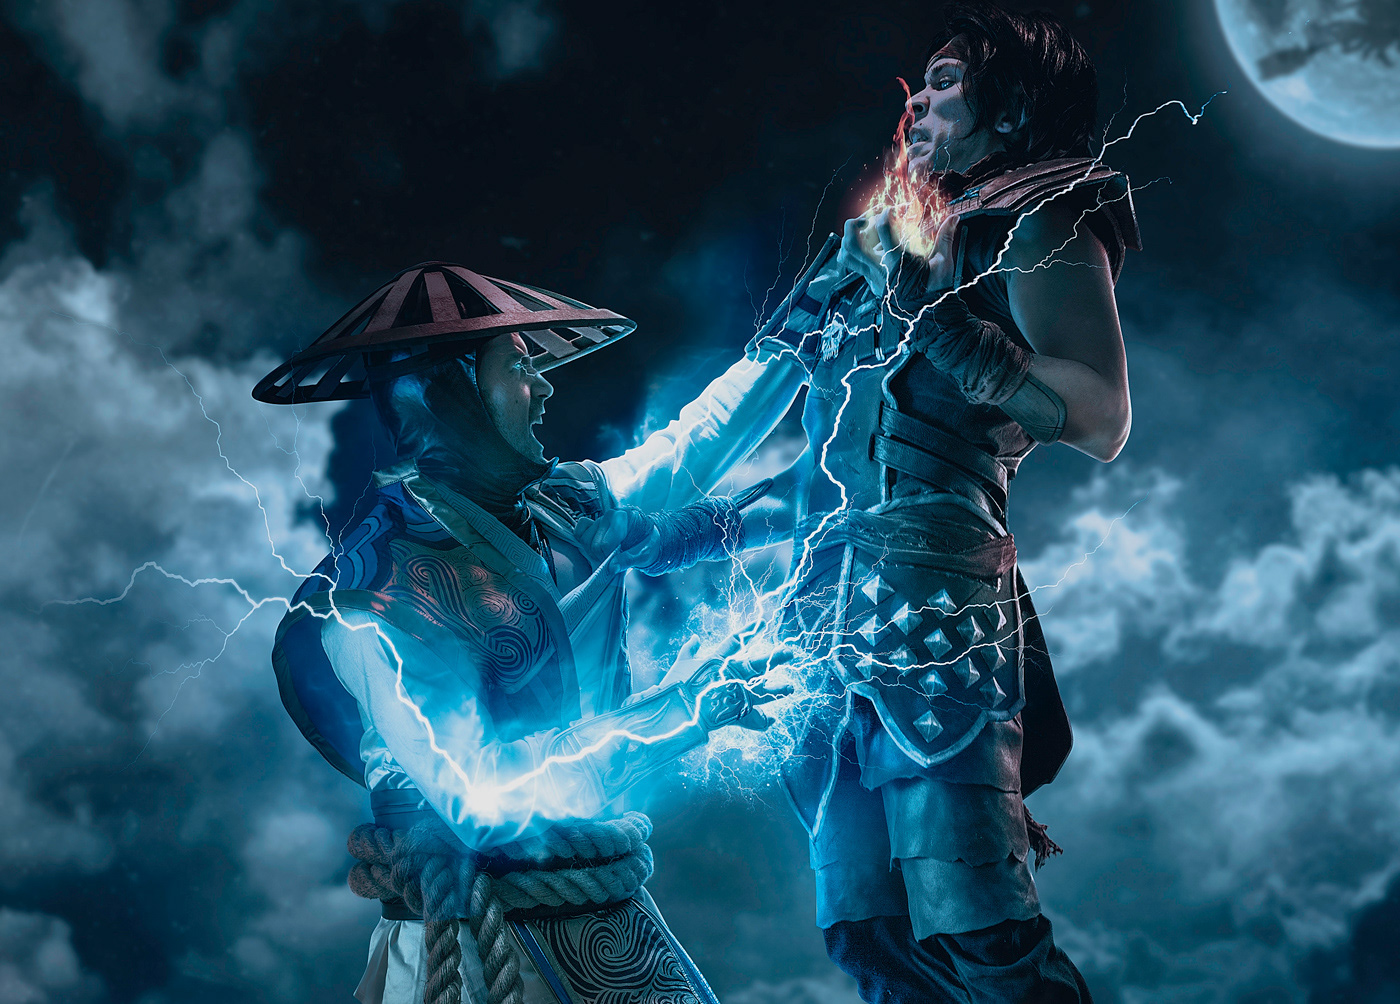 Videogames mortal kombat fight retouching  photoshop fatality Cosplay portrait Post Production